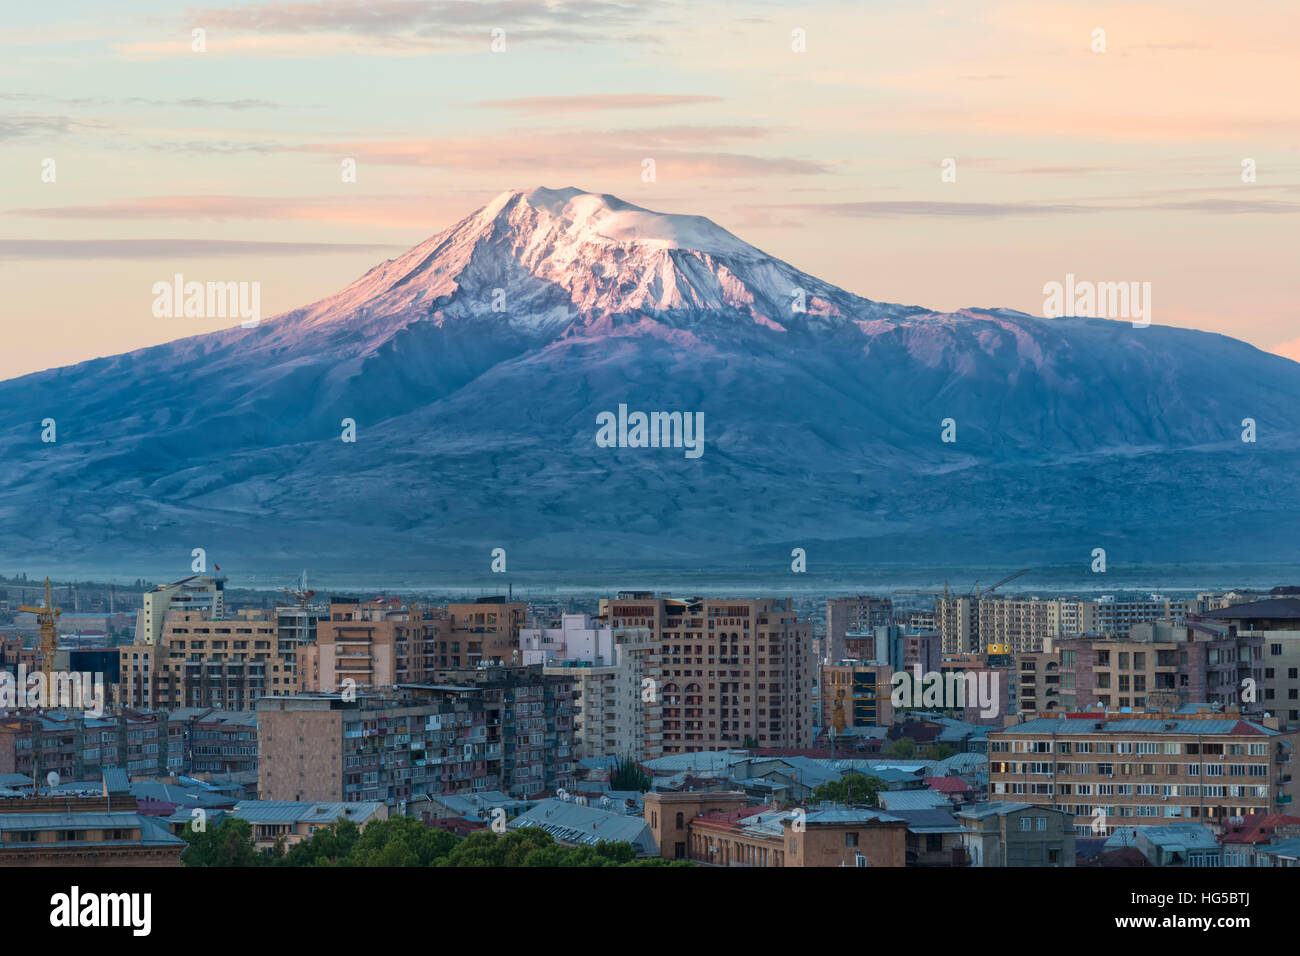 Monte Ararat e Yerevan visualizaram a partir de cascata no Sunrise, Yerevan, Arménia, Cemtral Ásia, Ásia Imagens de Stock